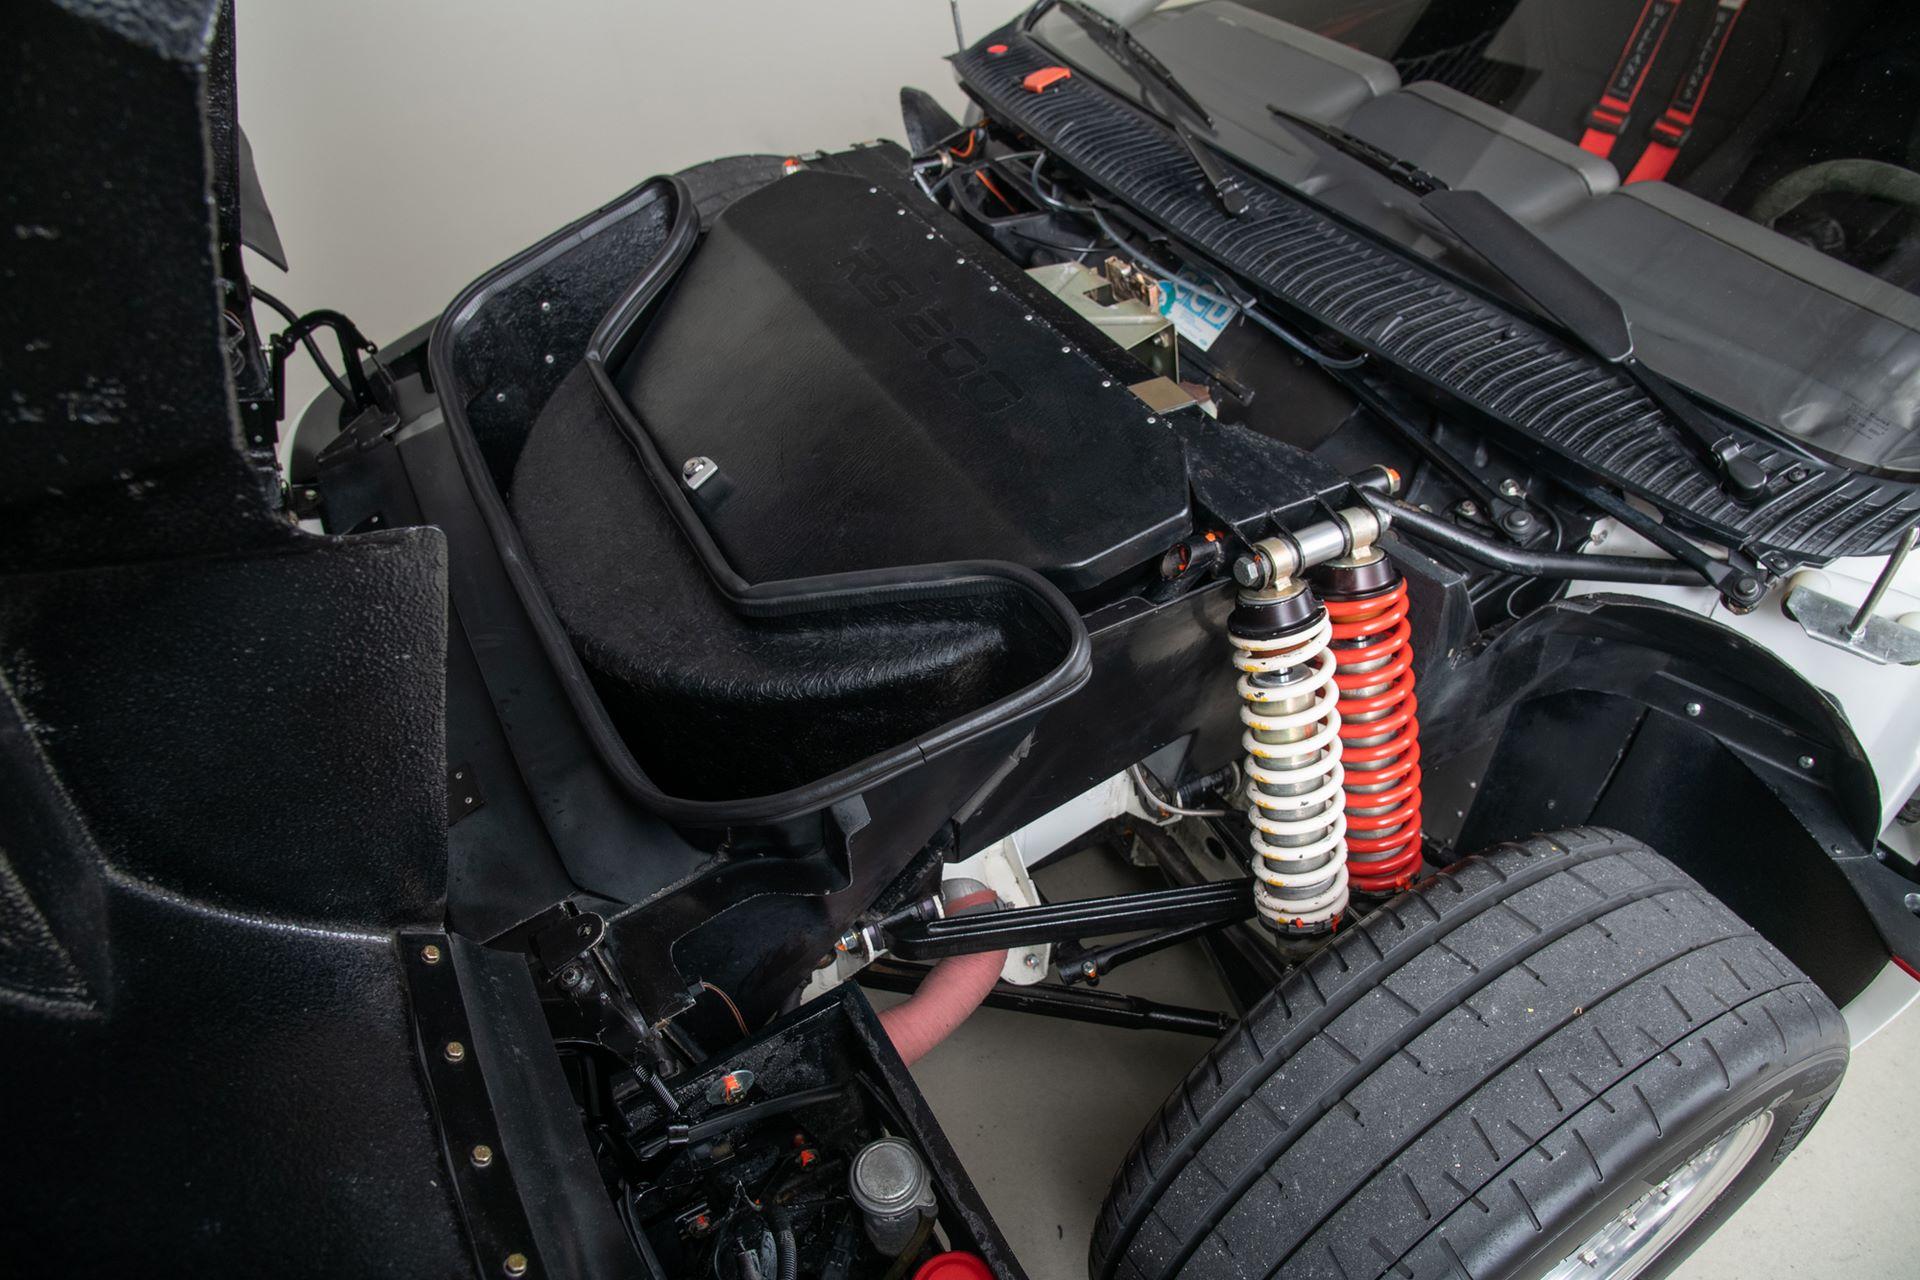 Ford-RS200-Evolution-Evo-for-sale-35